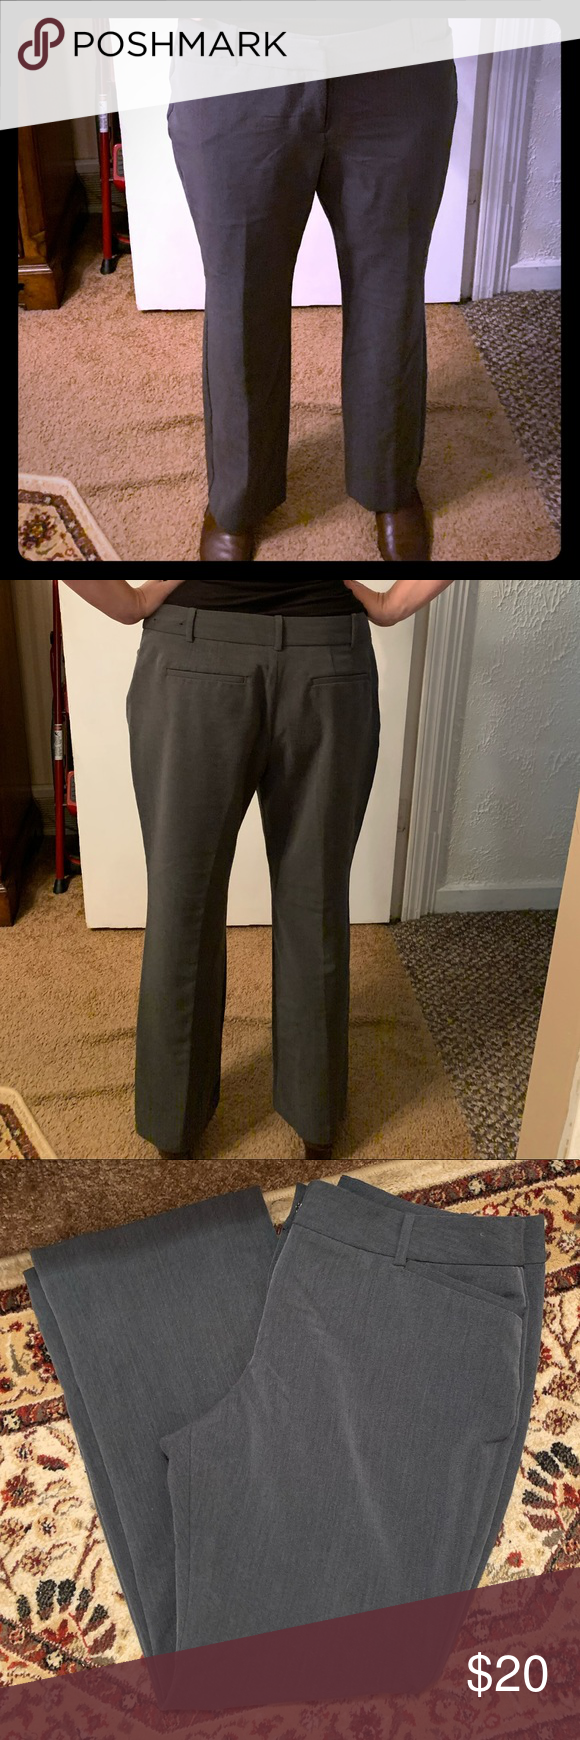 Worthington Petite Perfect Trouser 12p In 2020 Petite Dress Pants Worthington Clothes Design